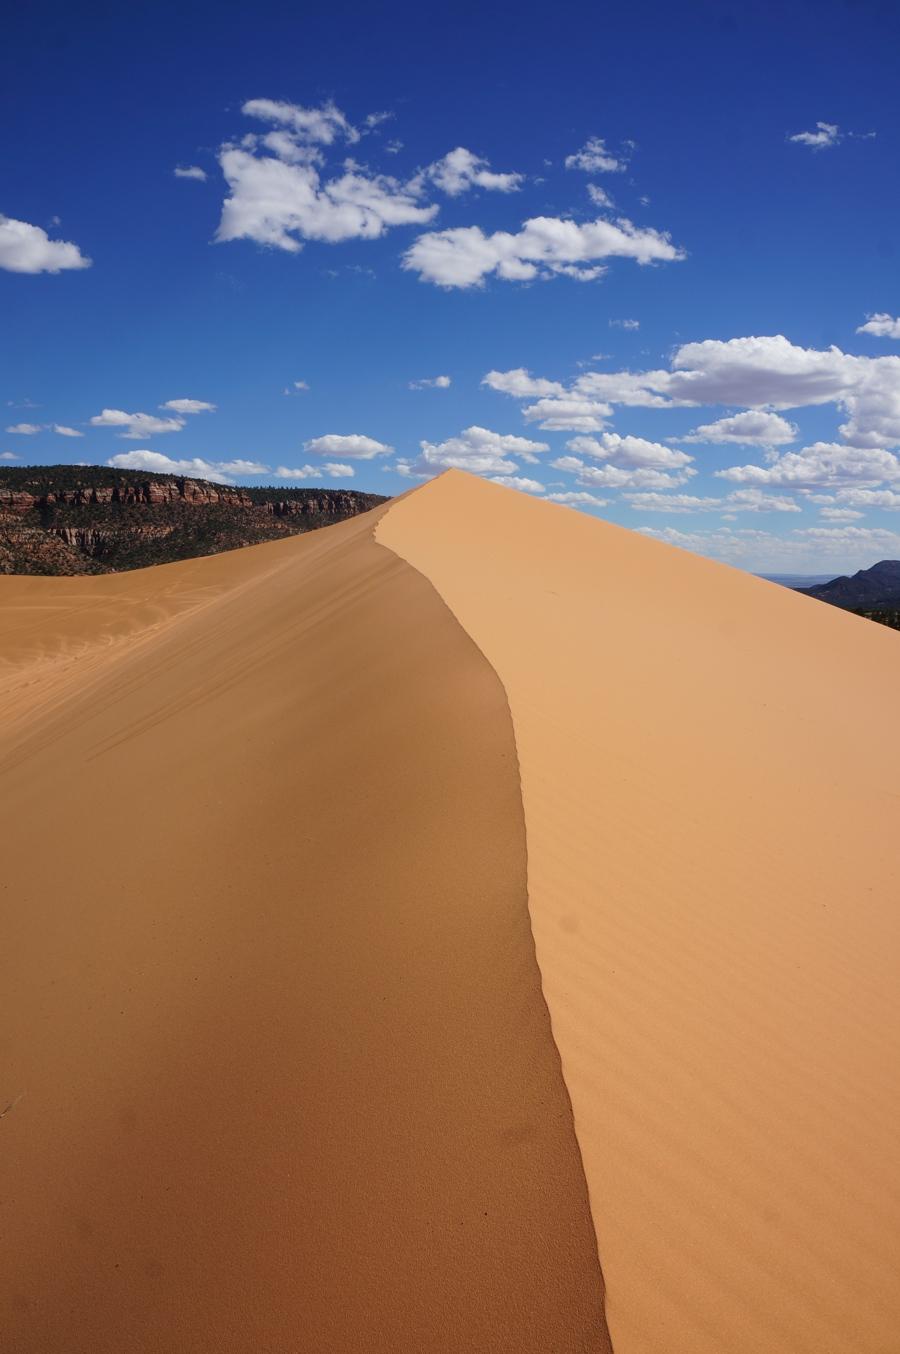 Sand-dunes-4.jpg